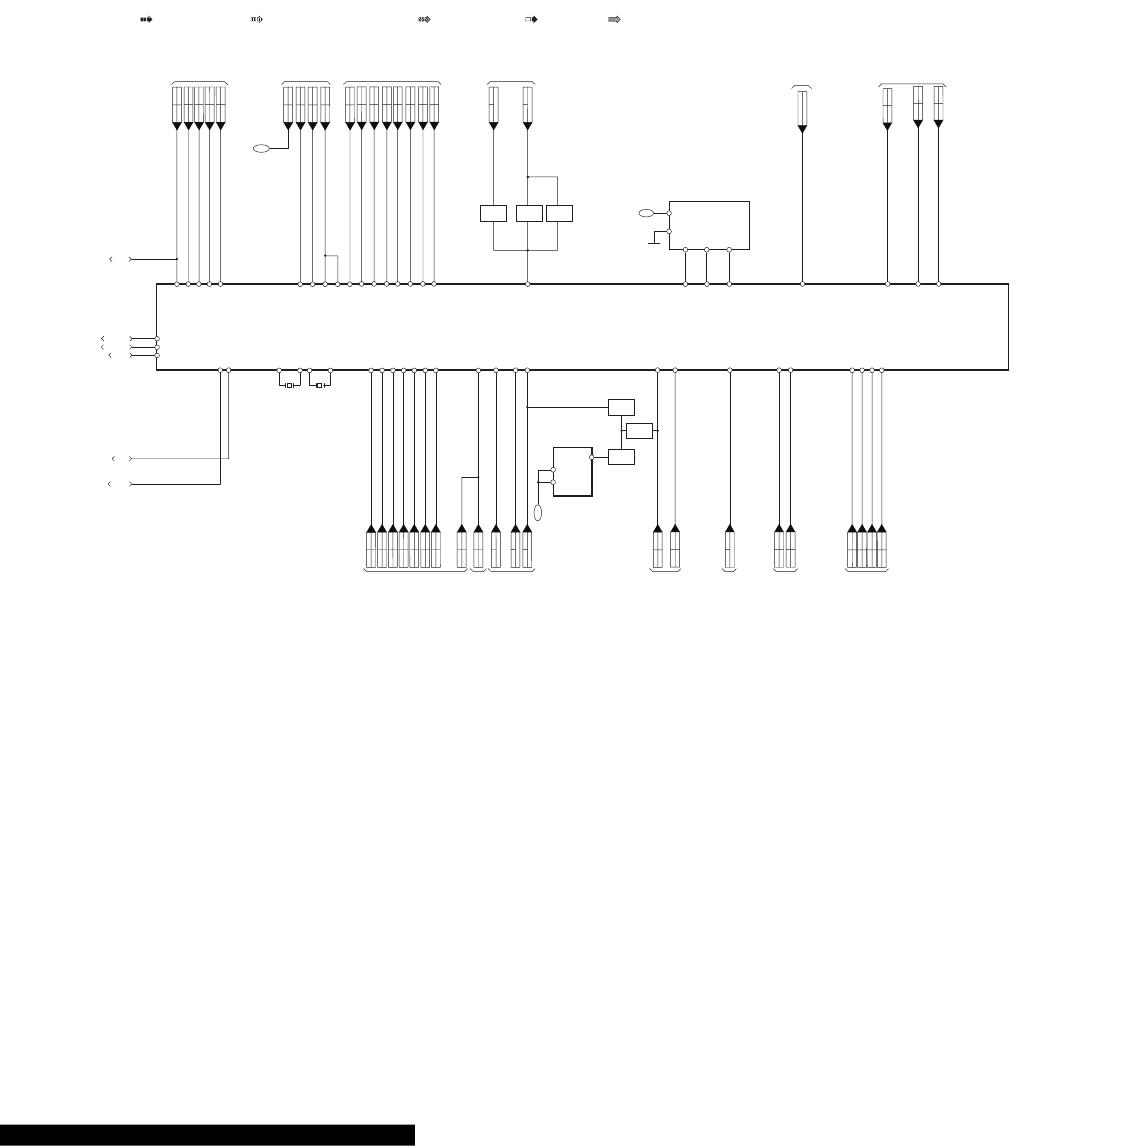 Panasonic Sa Ak785lm K Service Manual Manualslib Makes It Easy To Opticalpickuptachometer Schematic Main2 2 Block Diagram